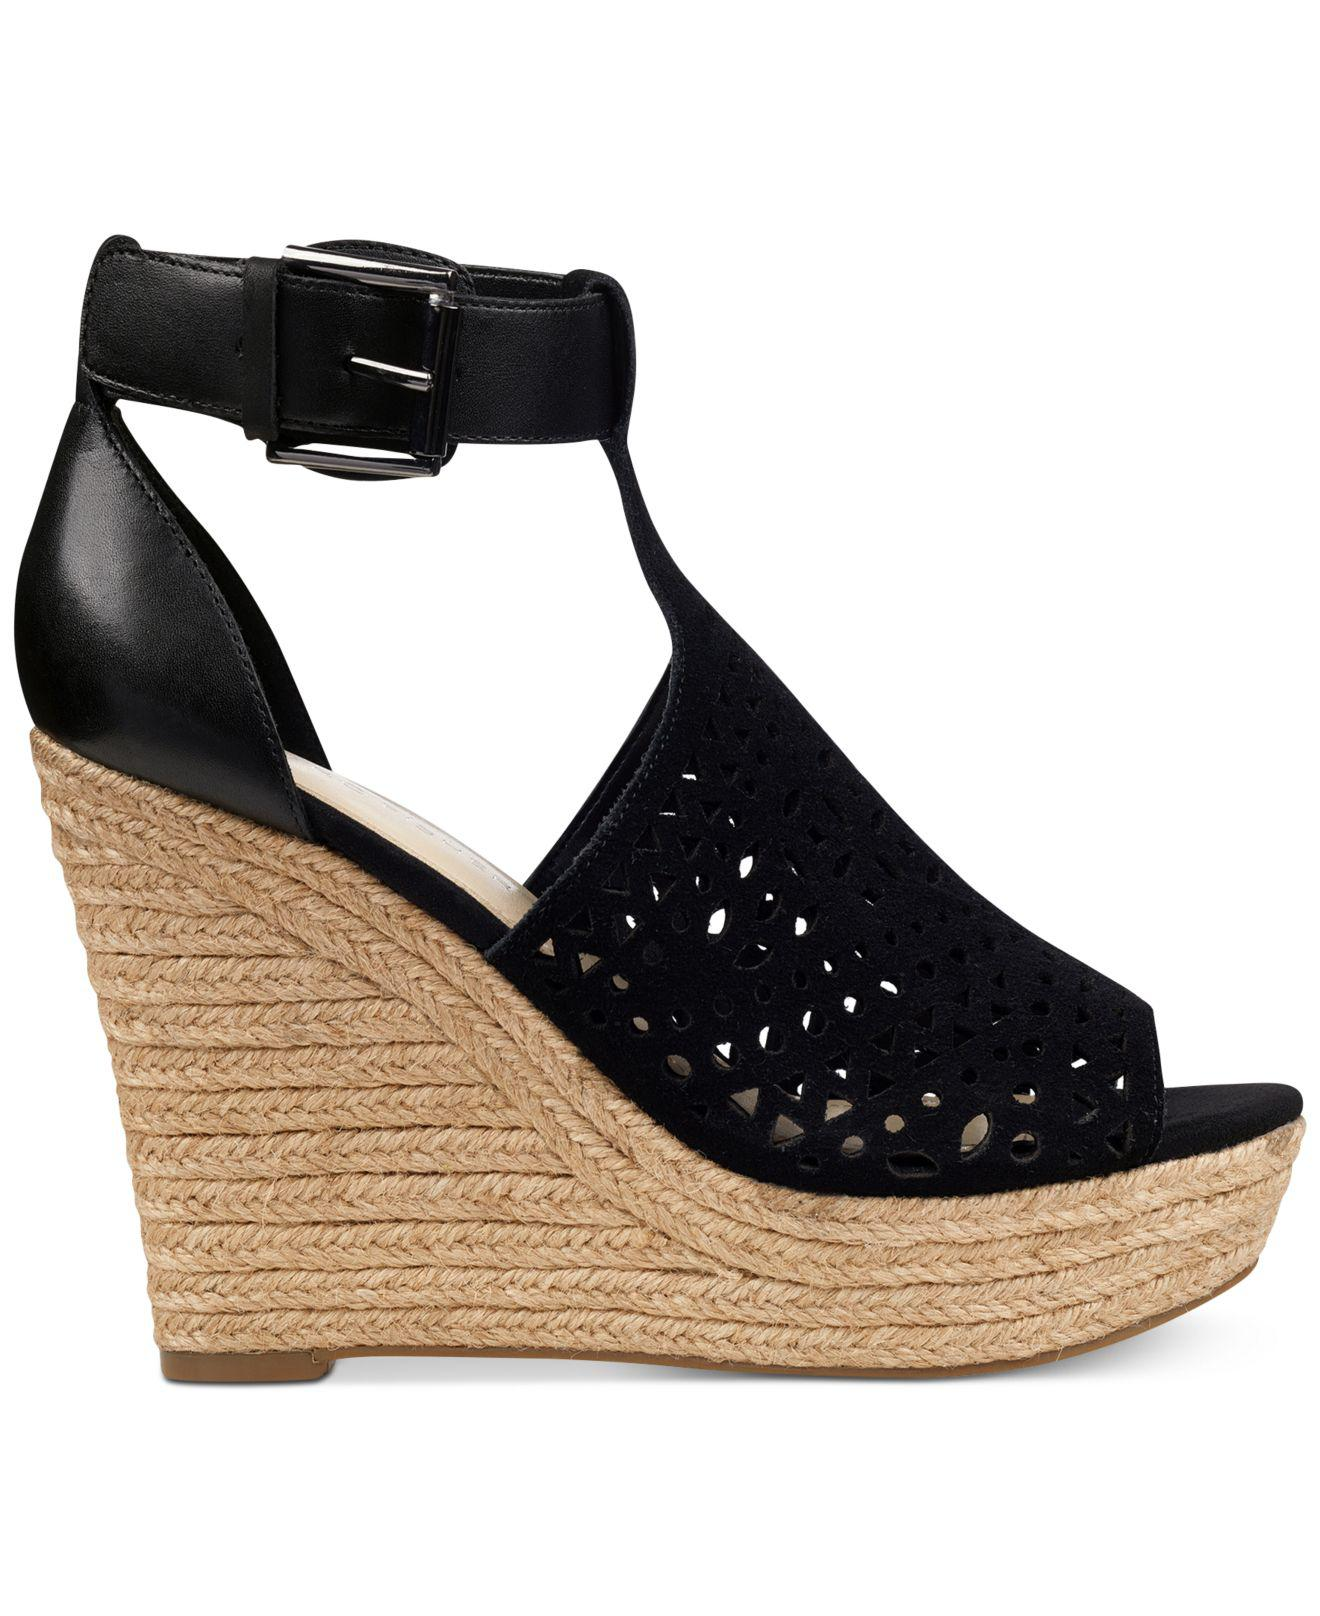 85ada5802248 Lyst - Marc Fisher Hasina T-strap Platform Wedge Sandals in Black